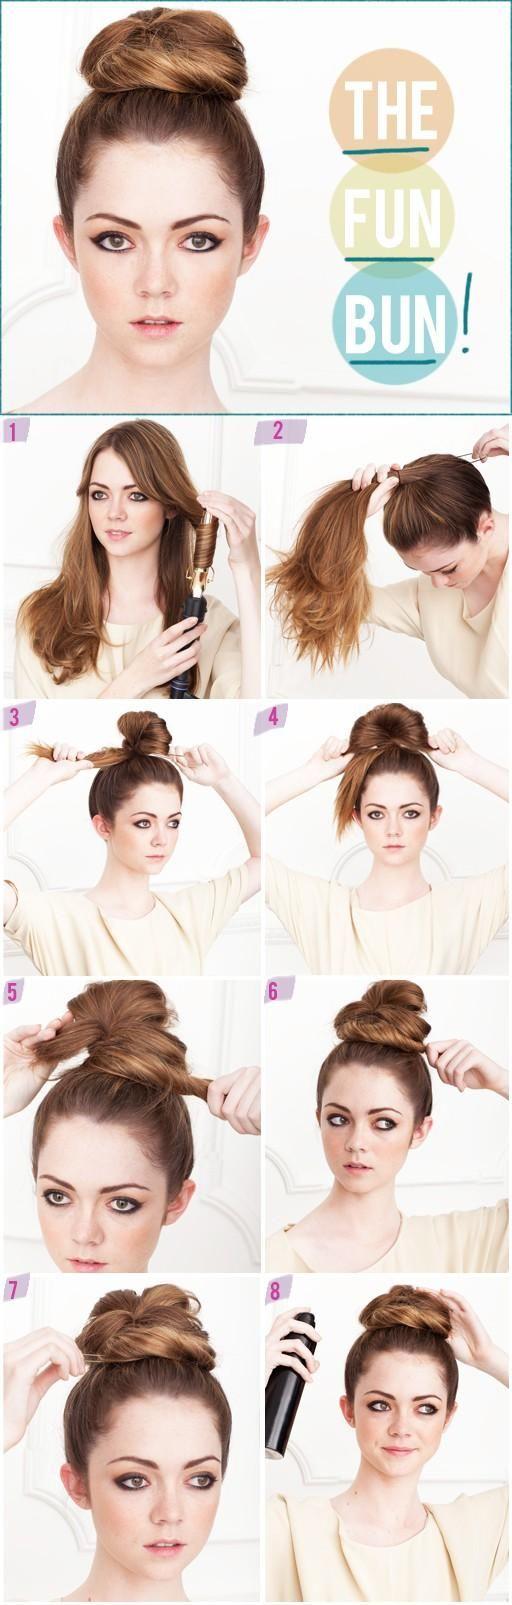 The Fun Bun... Everyone knows a high bun is my fav hairdo